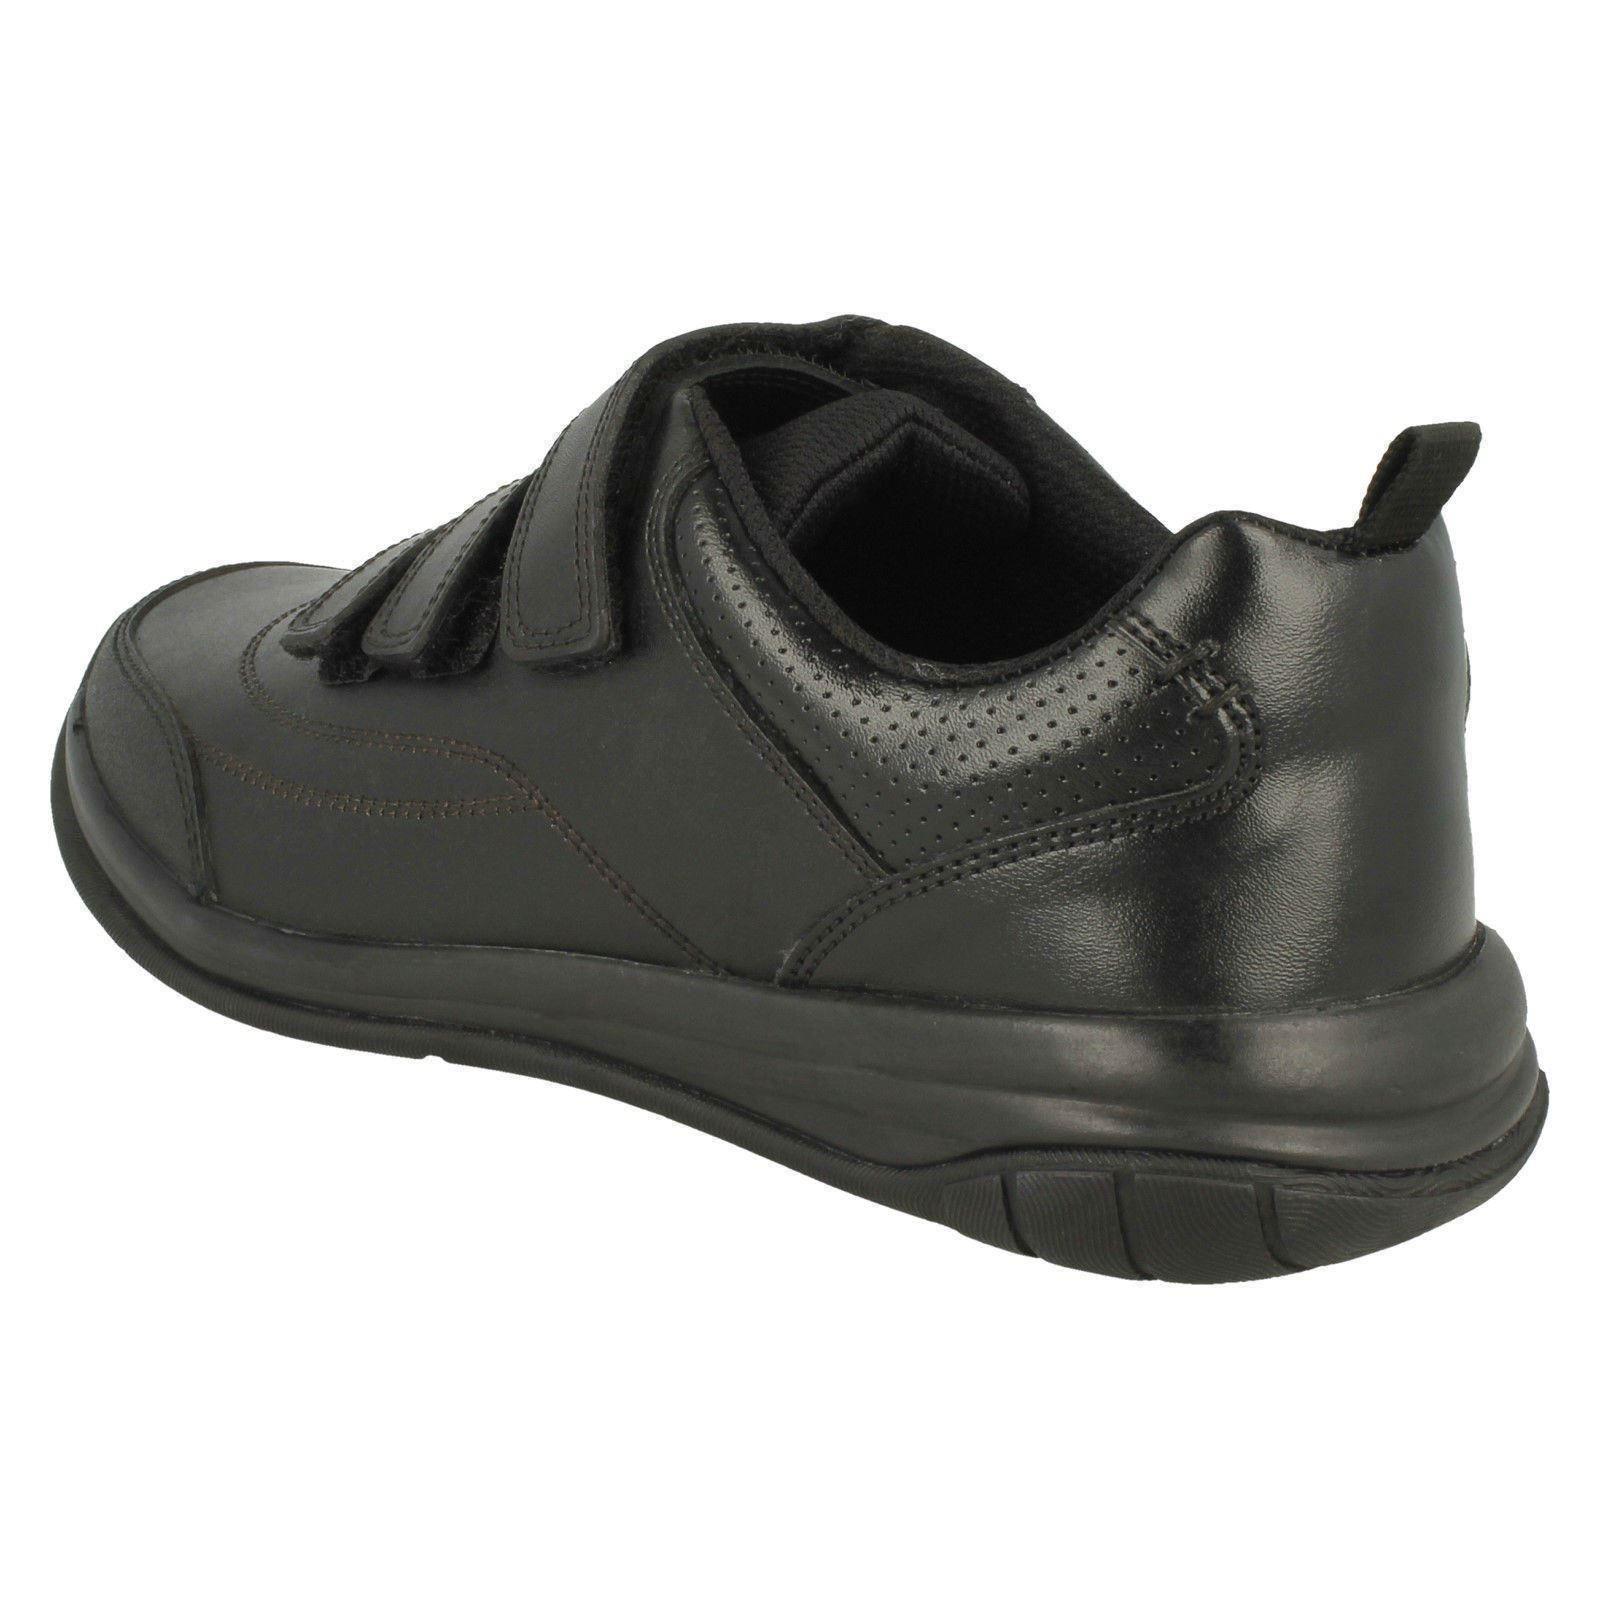 Clarks Boys School Shoes /'Hula Thrill/'